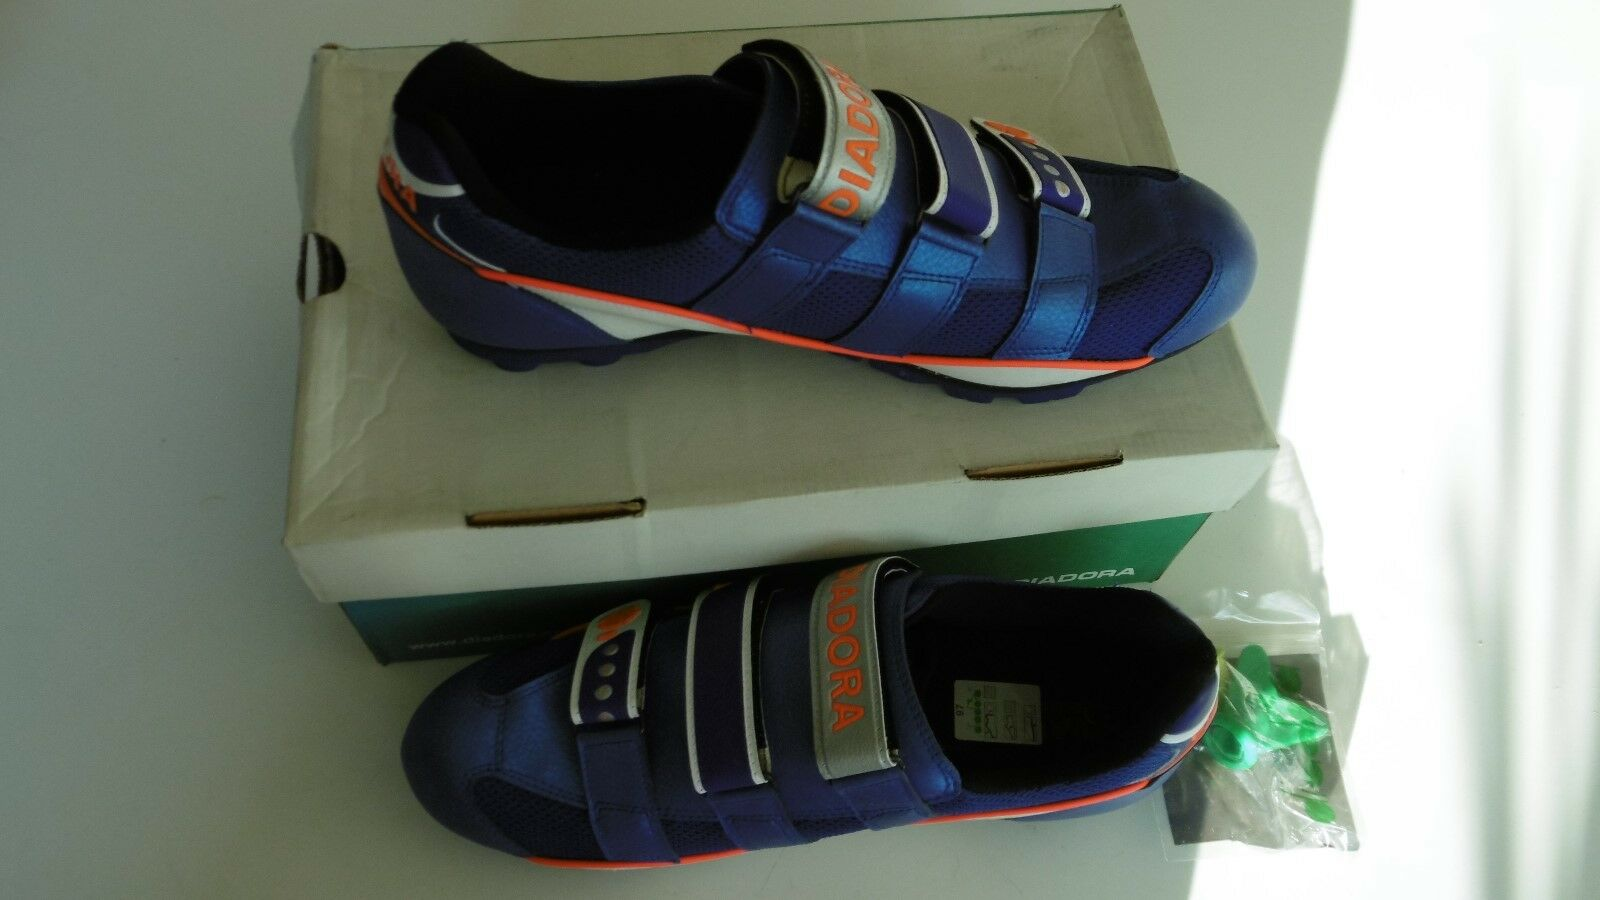 Diadora Yolo Blue Shoes Size 47 New In Box